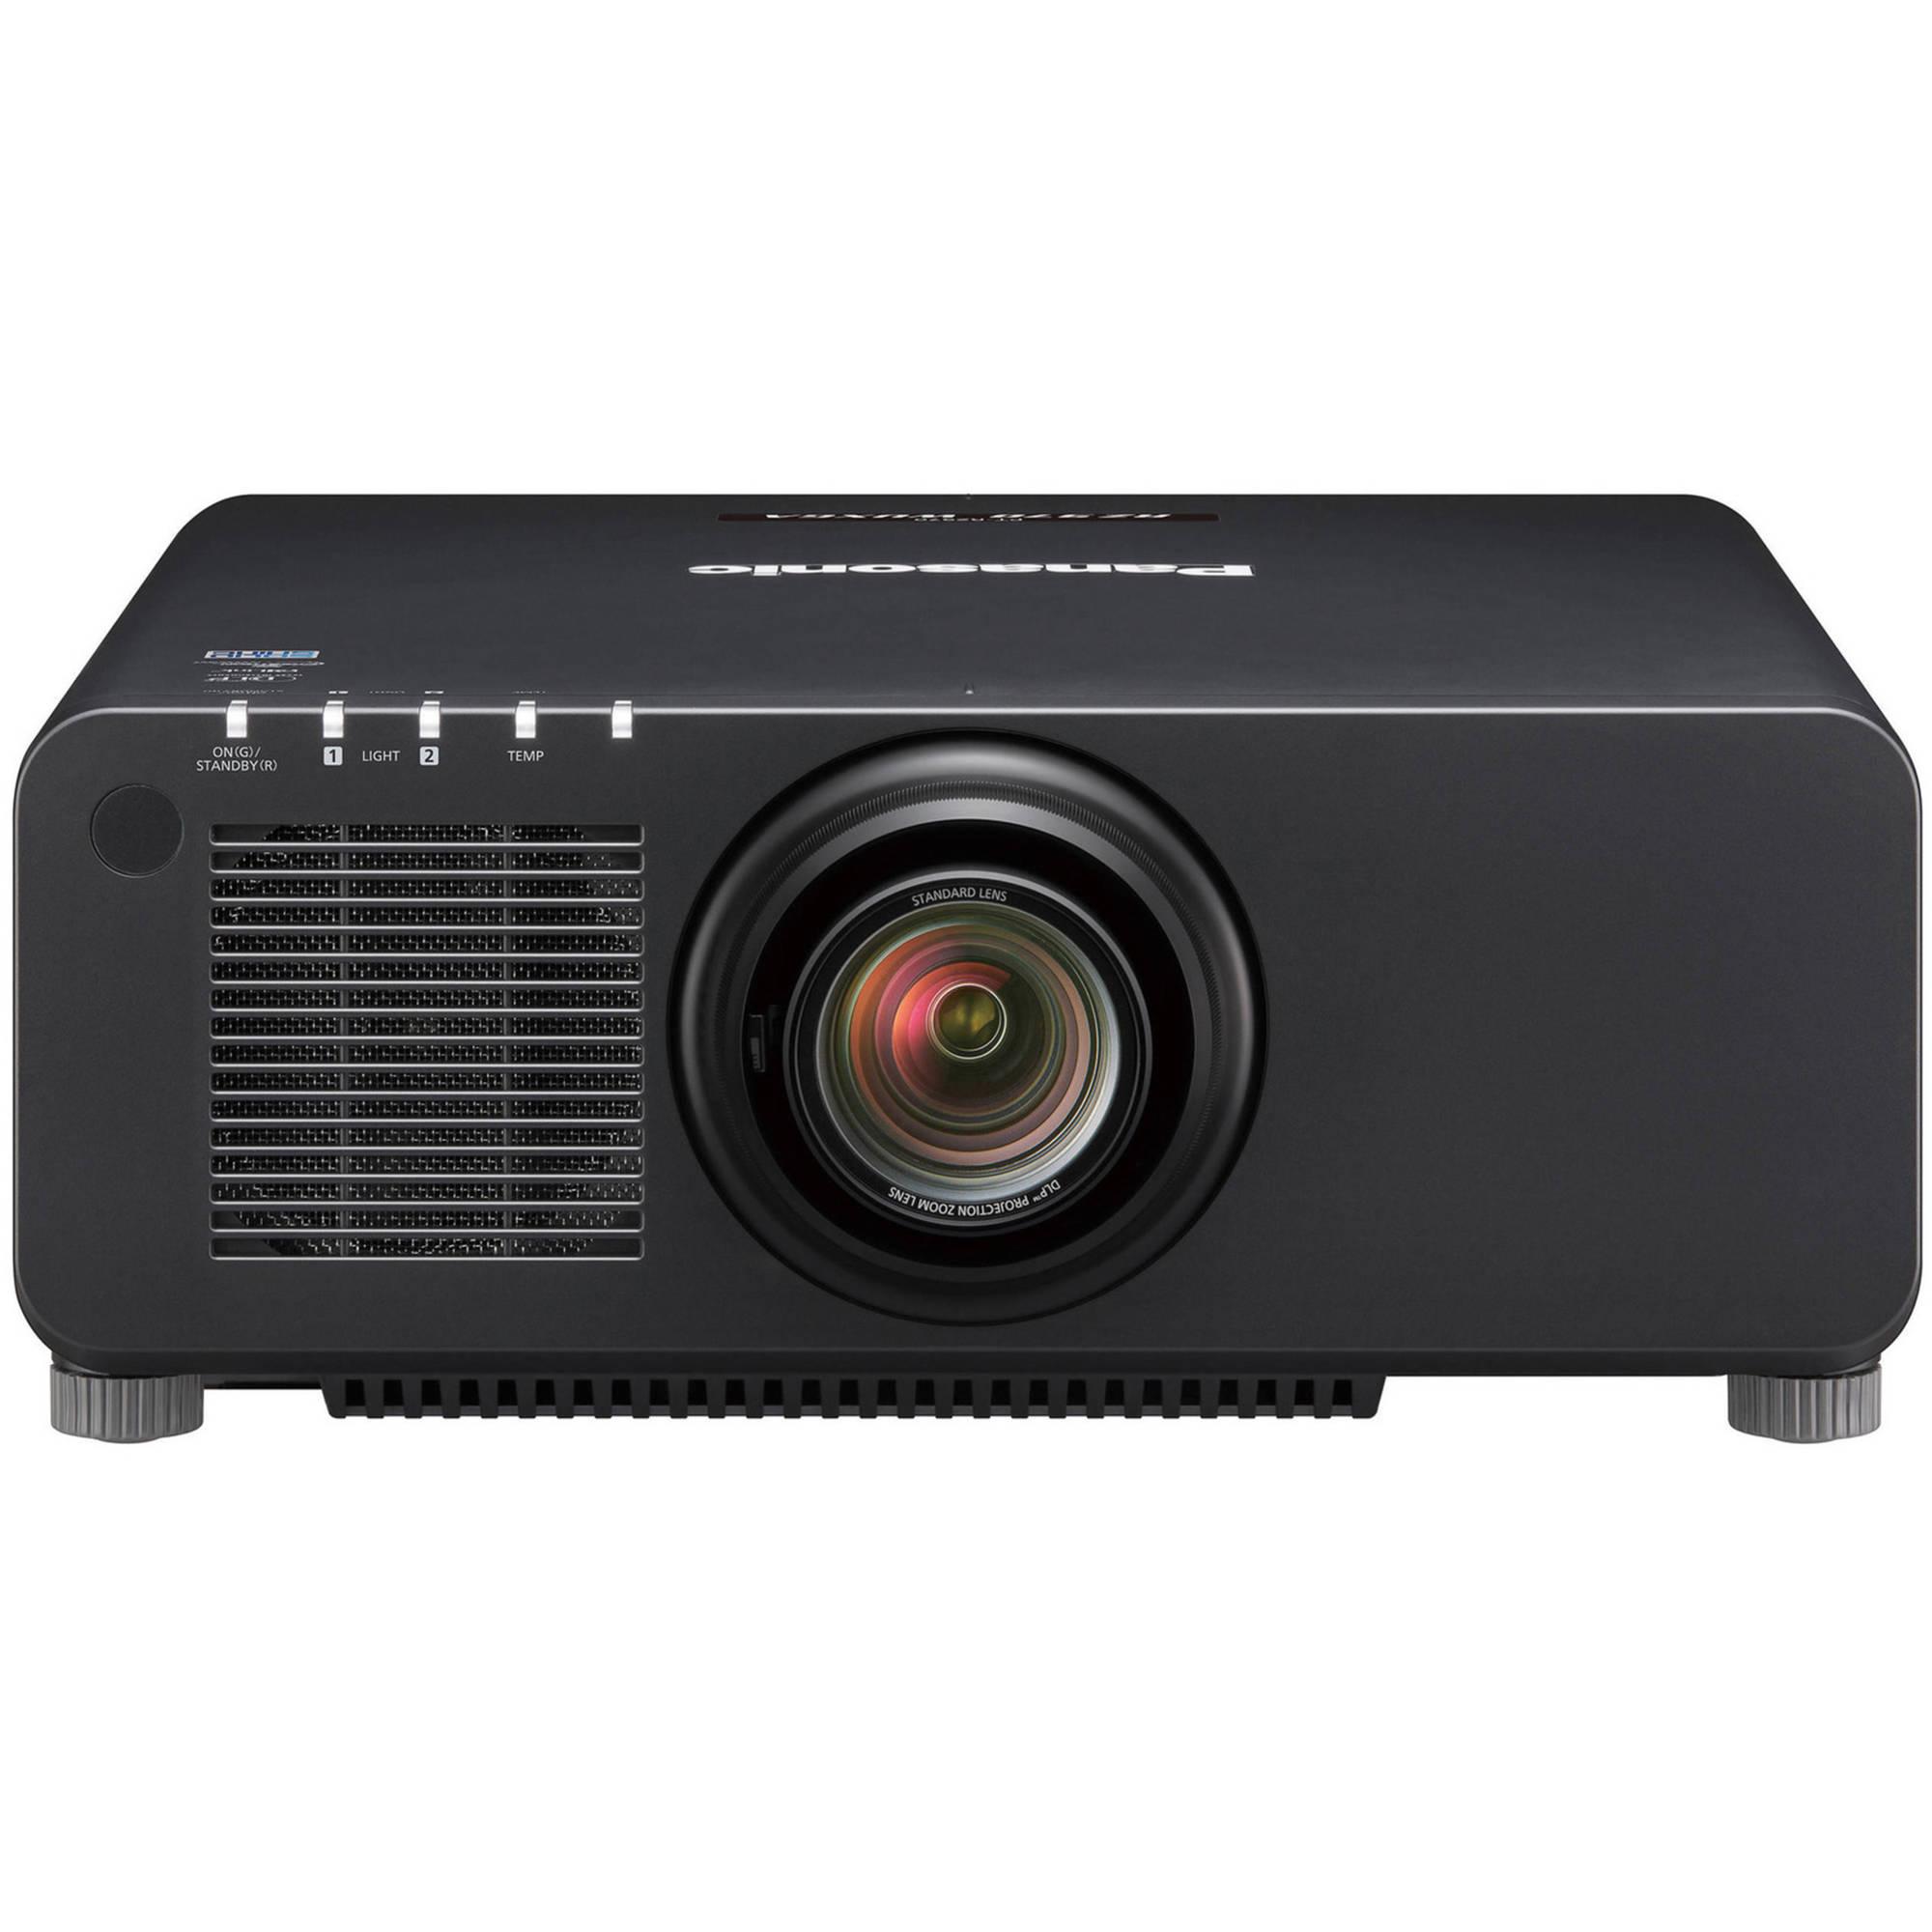 Rørig Panasonic PT-RZ970BU 10,000-Lumen WUXGA DLP Projector PT-RZ970BU PS-68